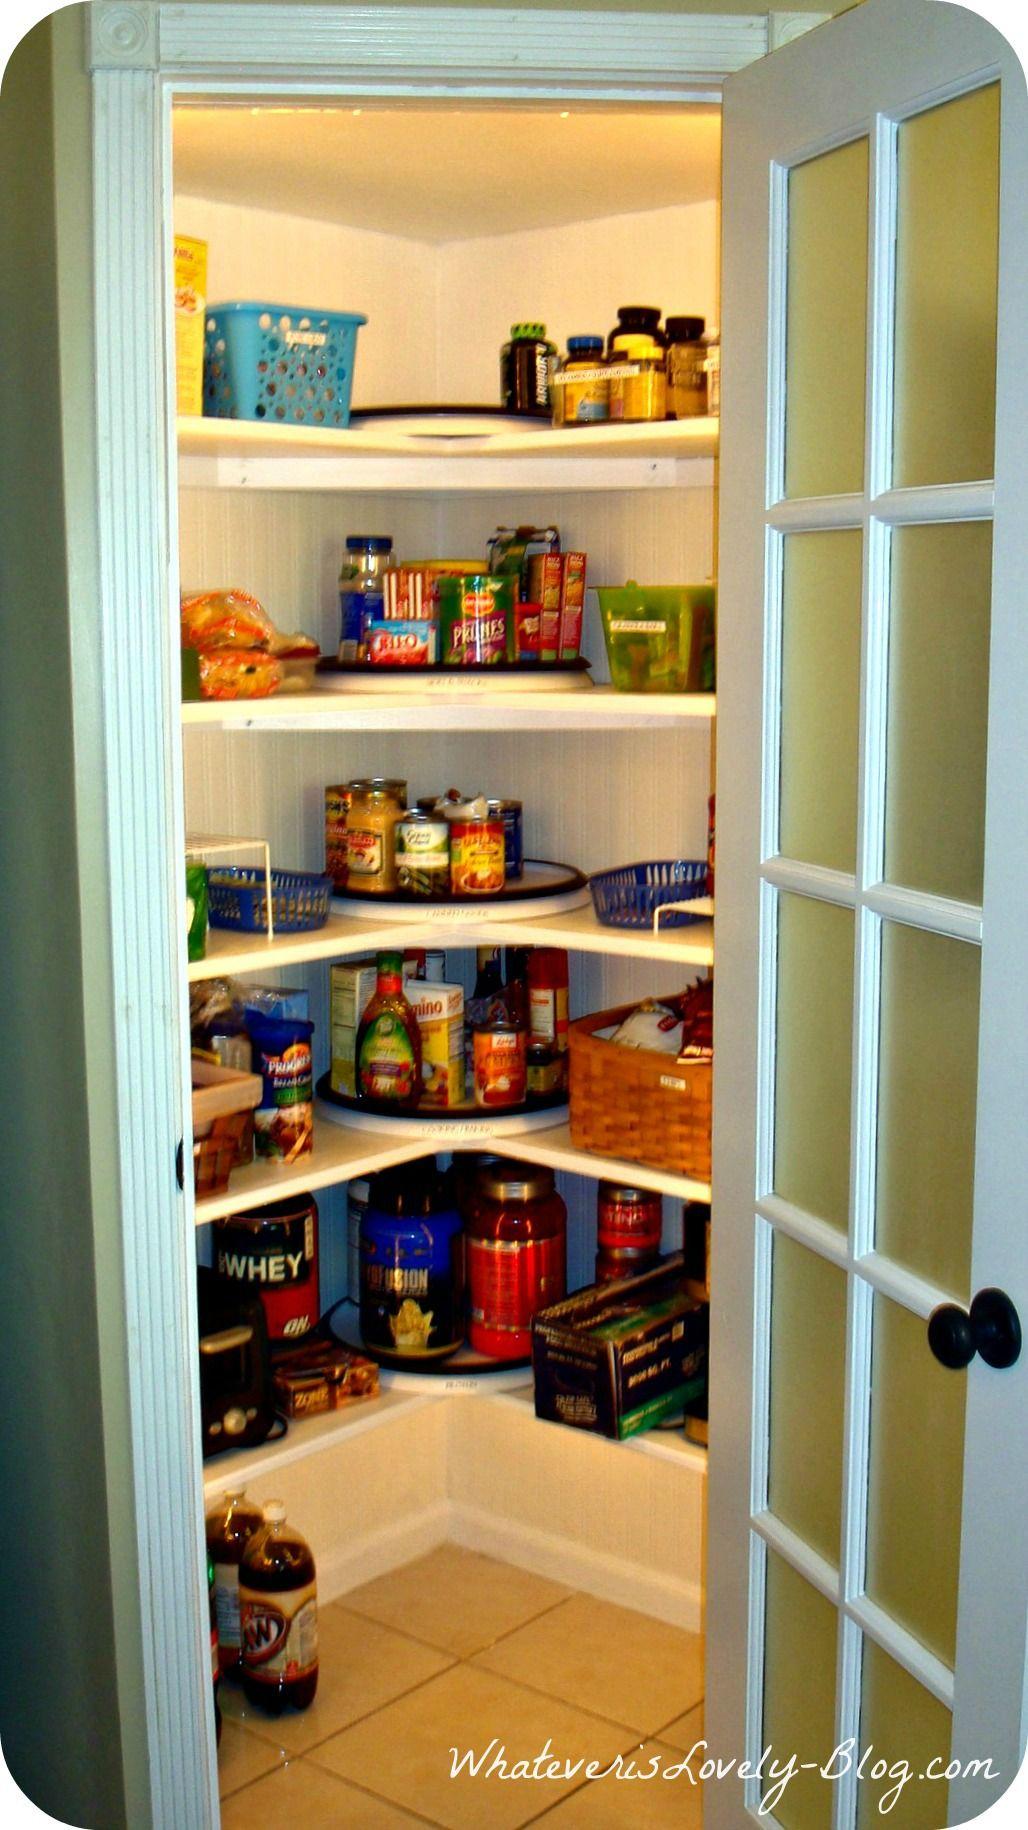 Whateverislovely Blog Com Corner Pantry Pantry Layout Corner Pantry Cabinet